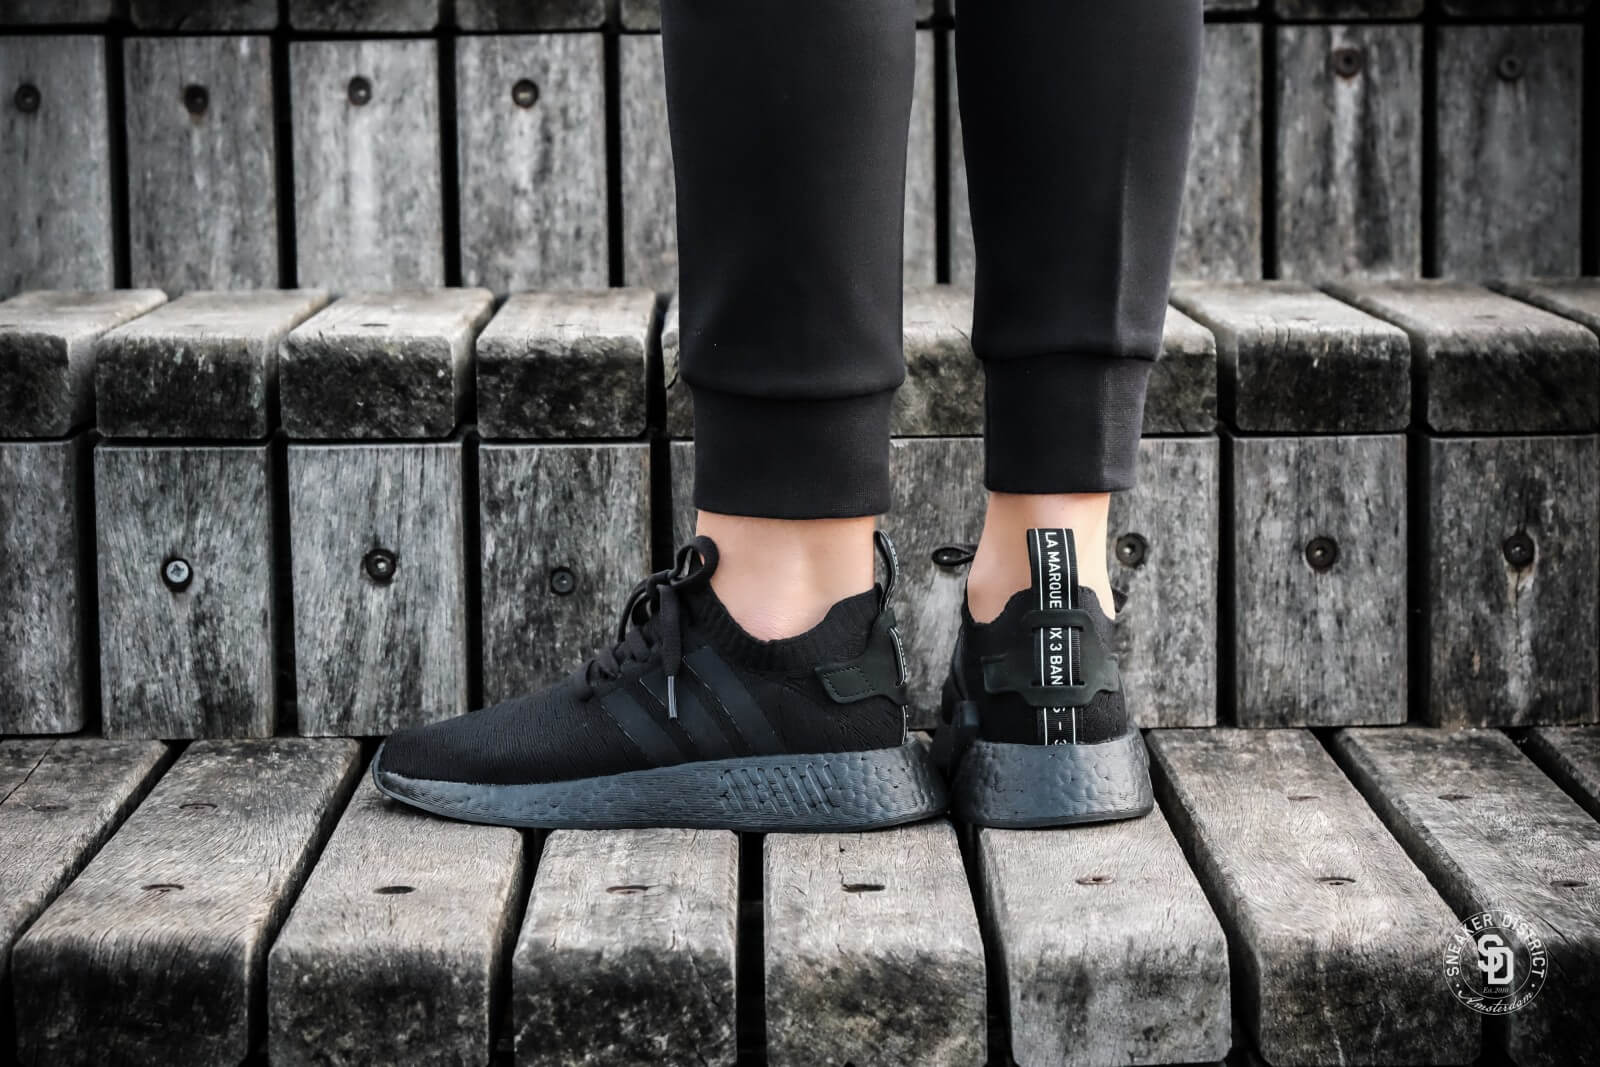 Adidas Women's NMD R2 Primeknit Core Black